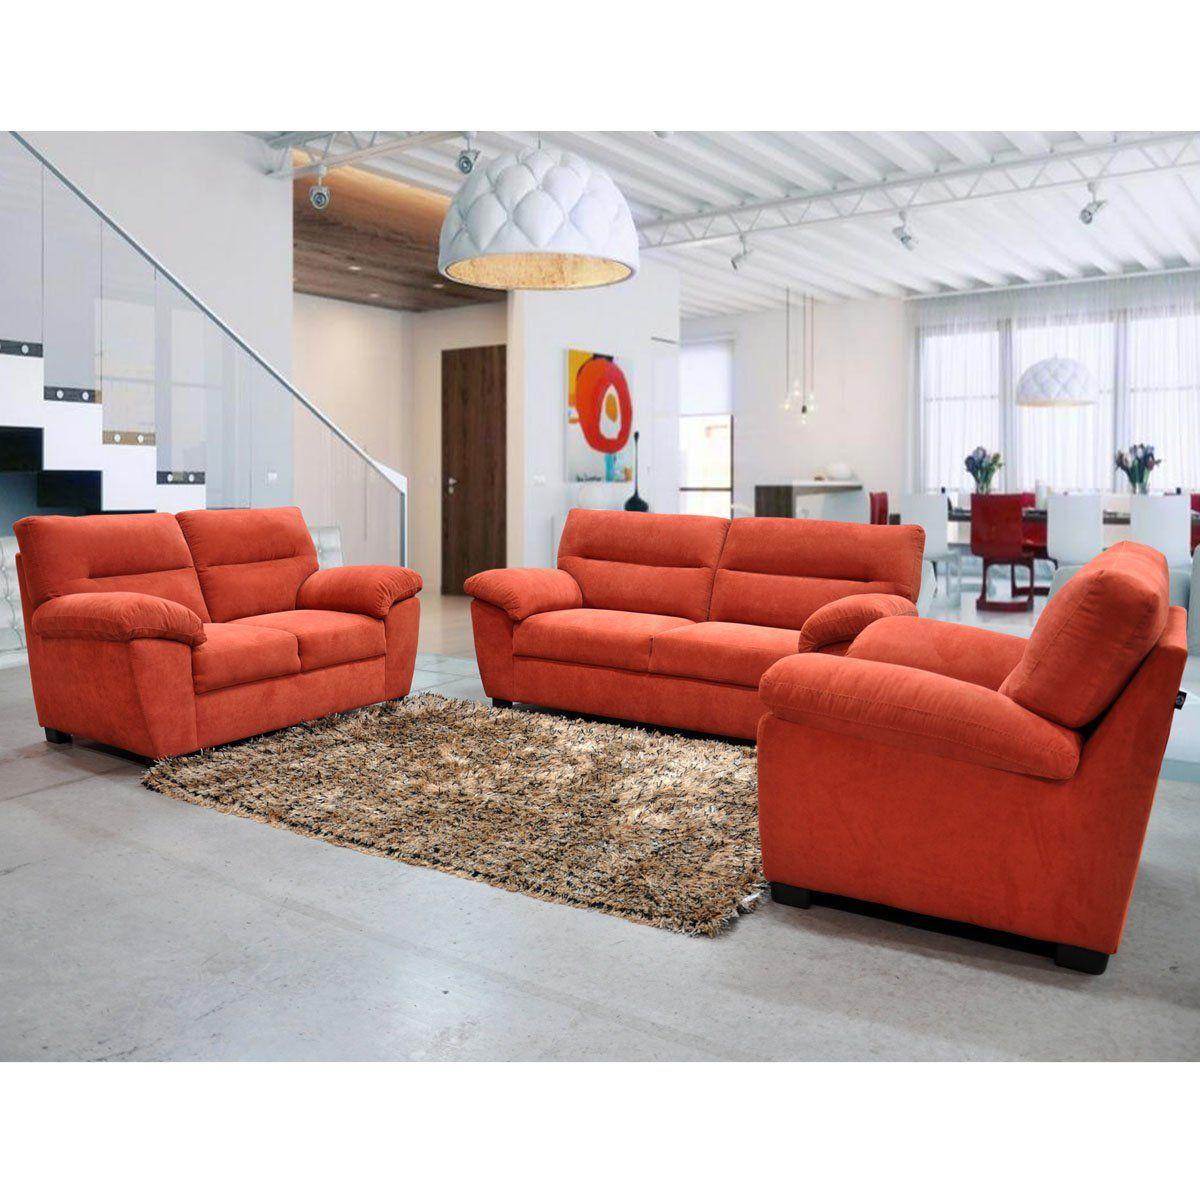 Sala Greco 3-2-1 tapizado en tela terracota | SEARS.COM.MX - Me ...